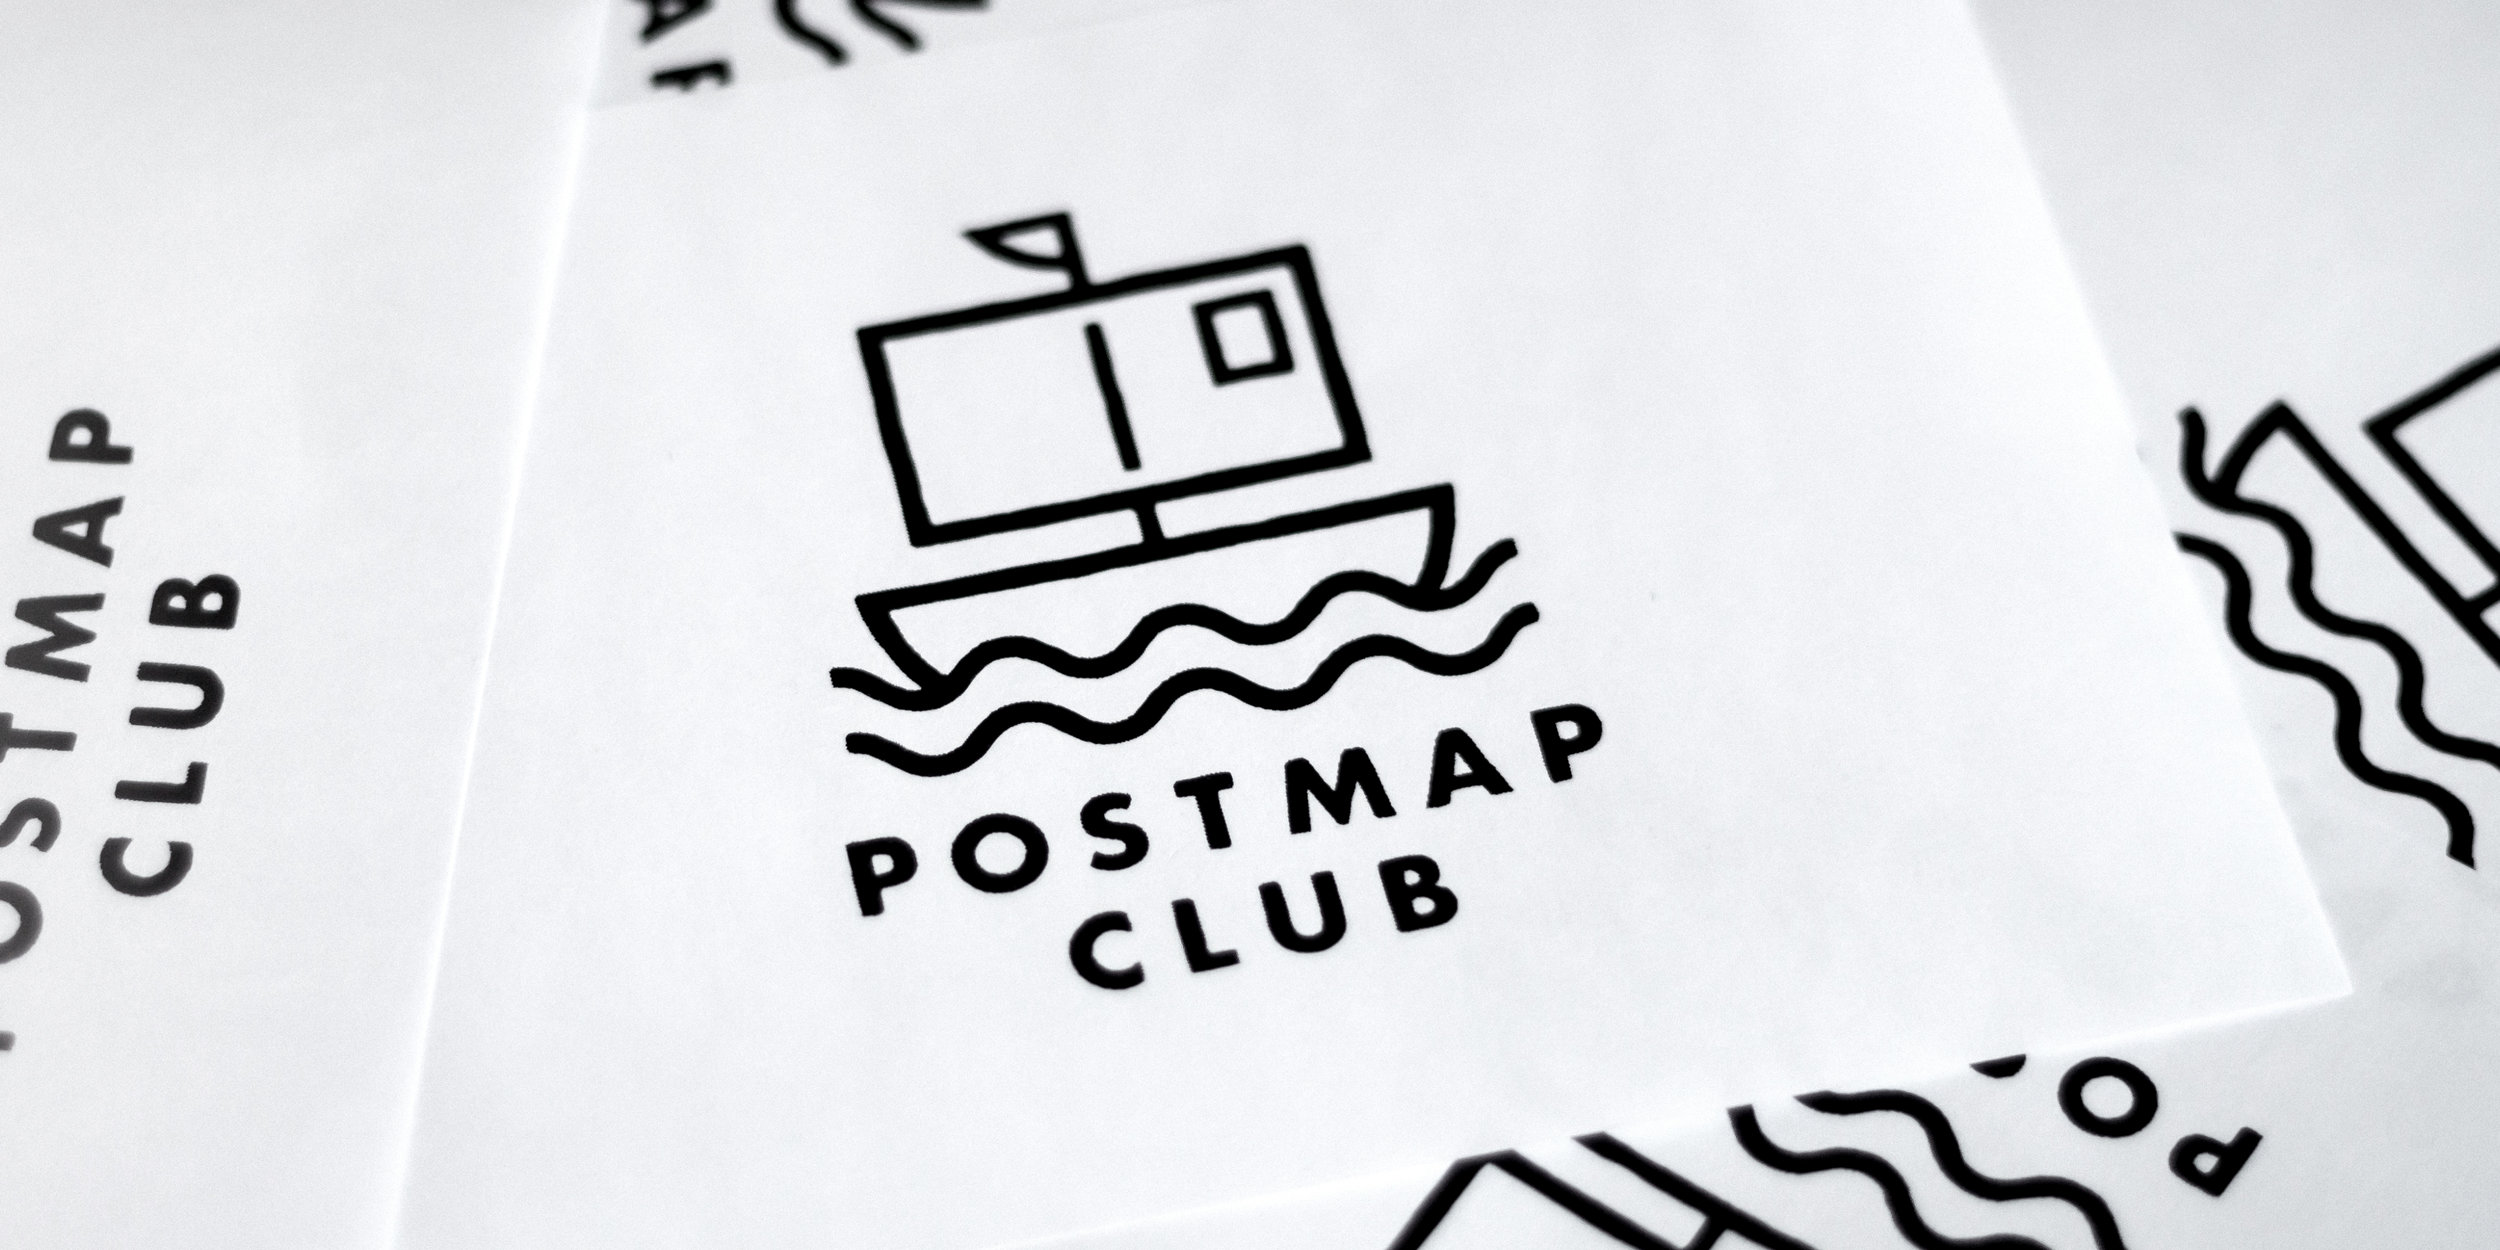 postmap-banner-02.jpg